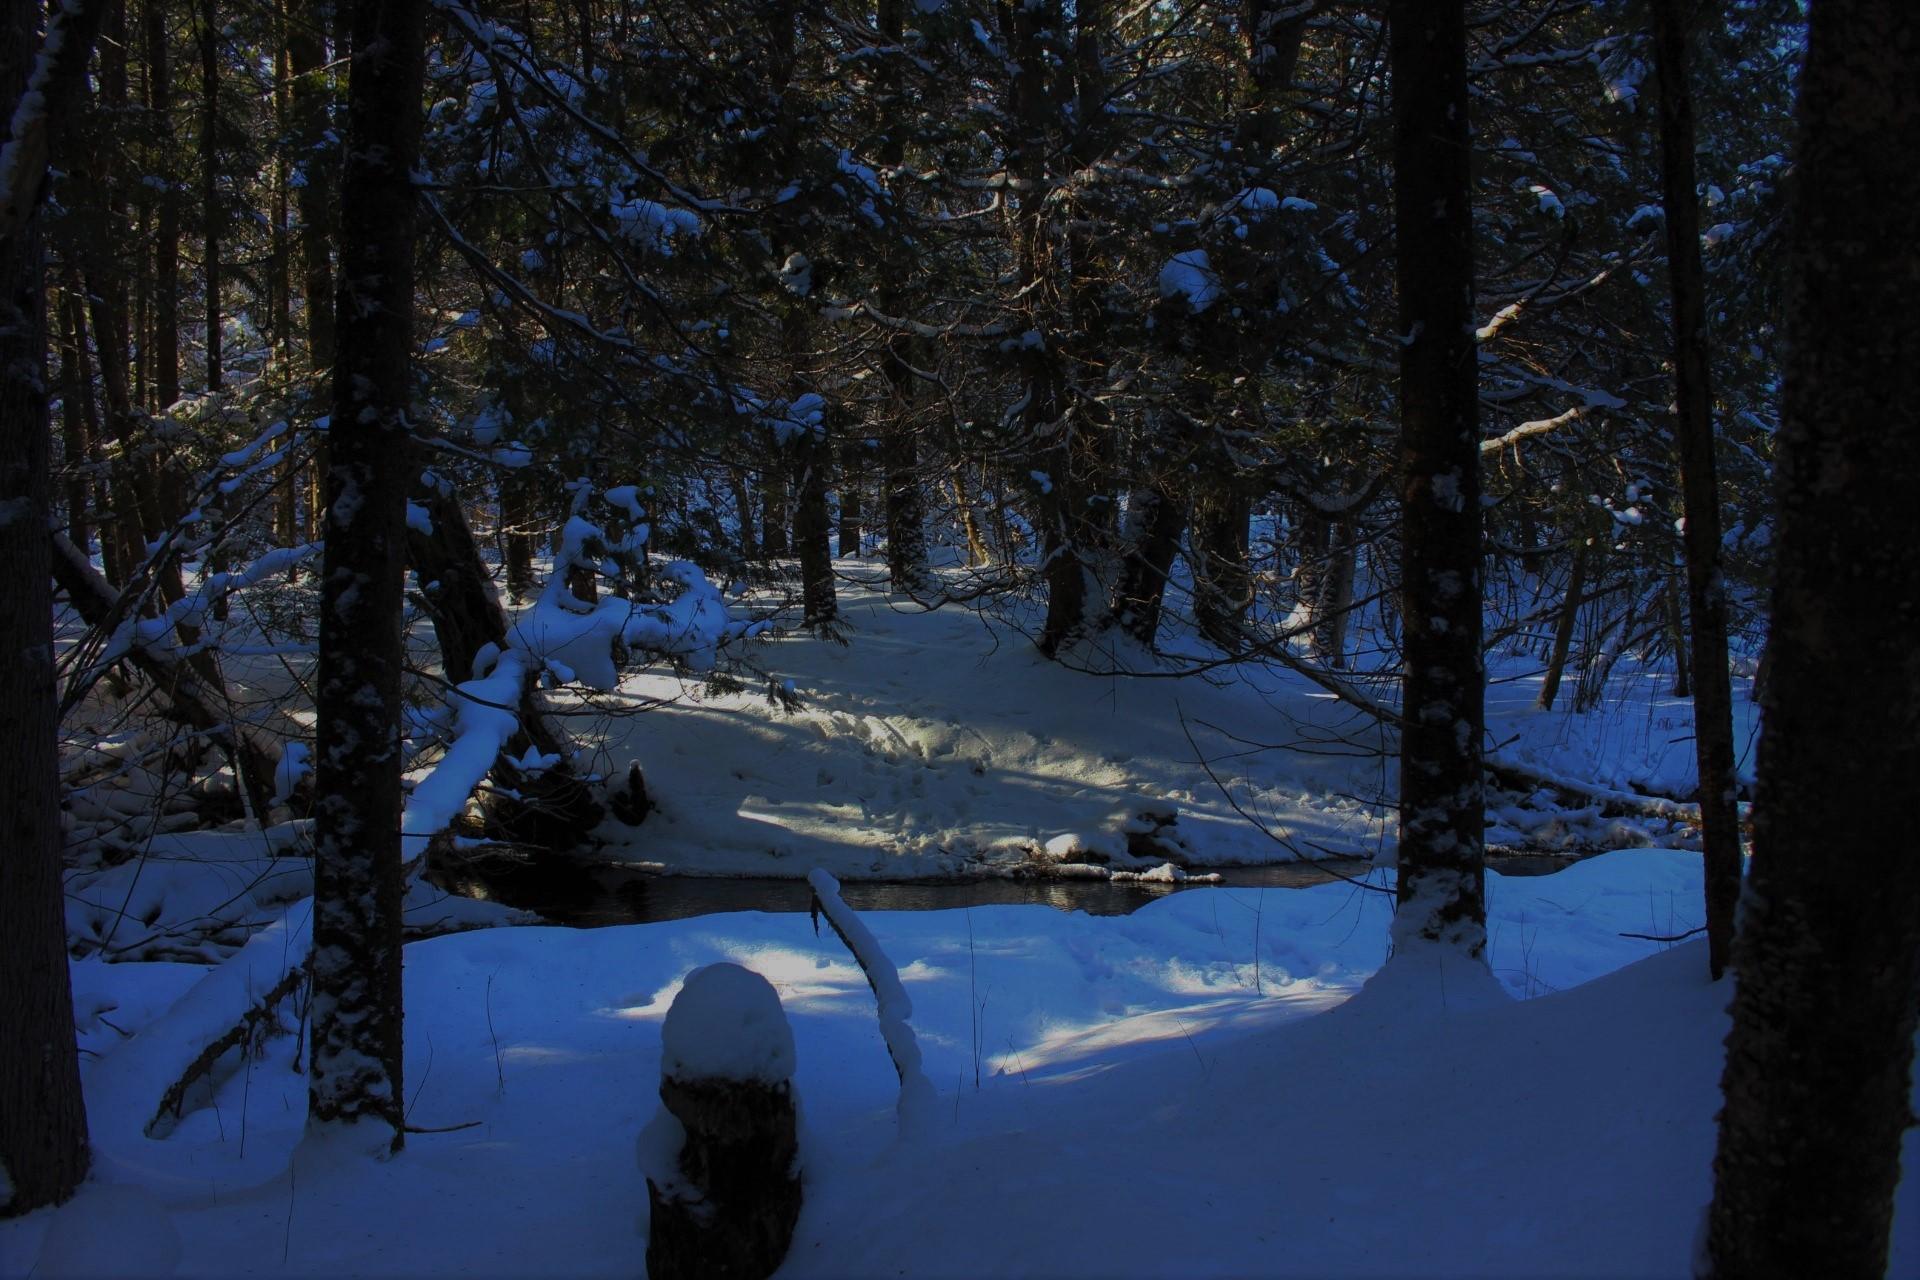 Snowy Trails Dark 3 - MARSH BY MOONLIGHT SNOWSHOE